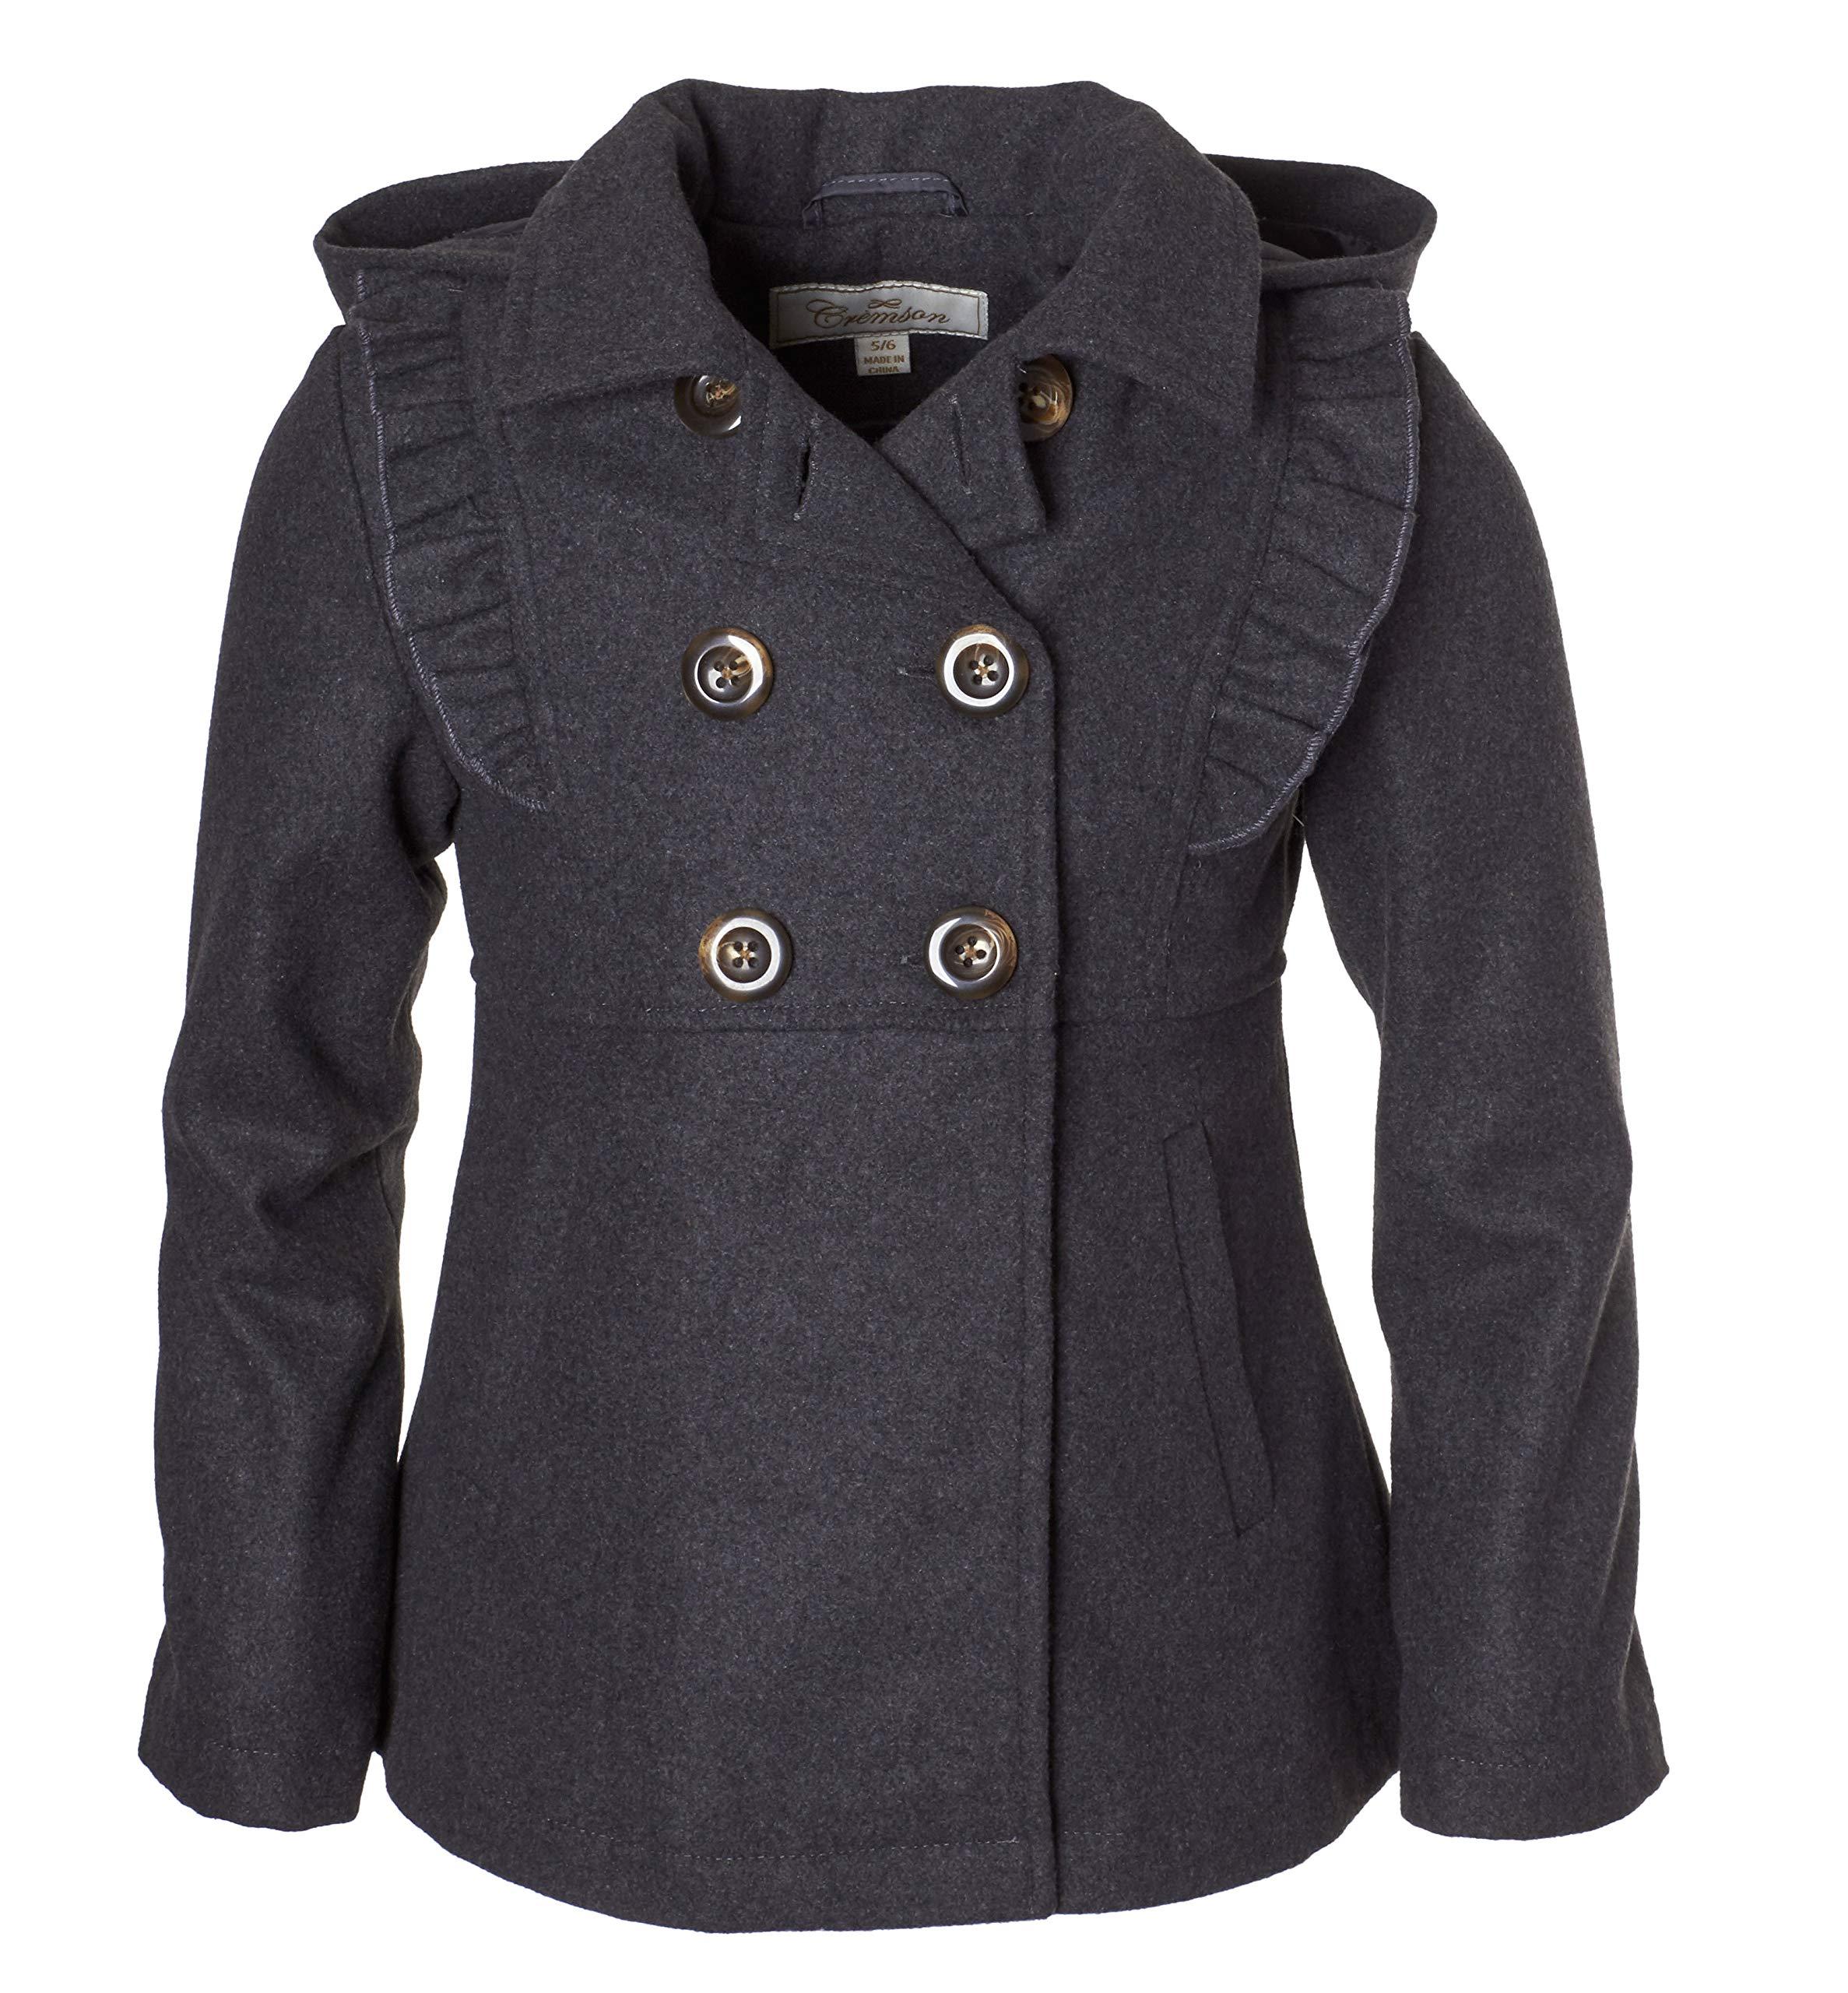 Cremson Girls' Wool Blend Hooded Ruffle Winter Dress Pea Coat Jacket - Charcoal (Size 5/6)